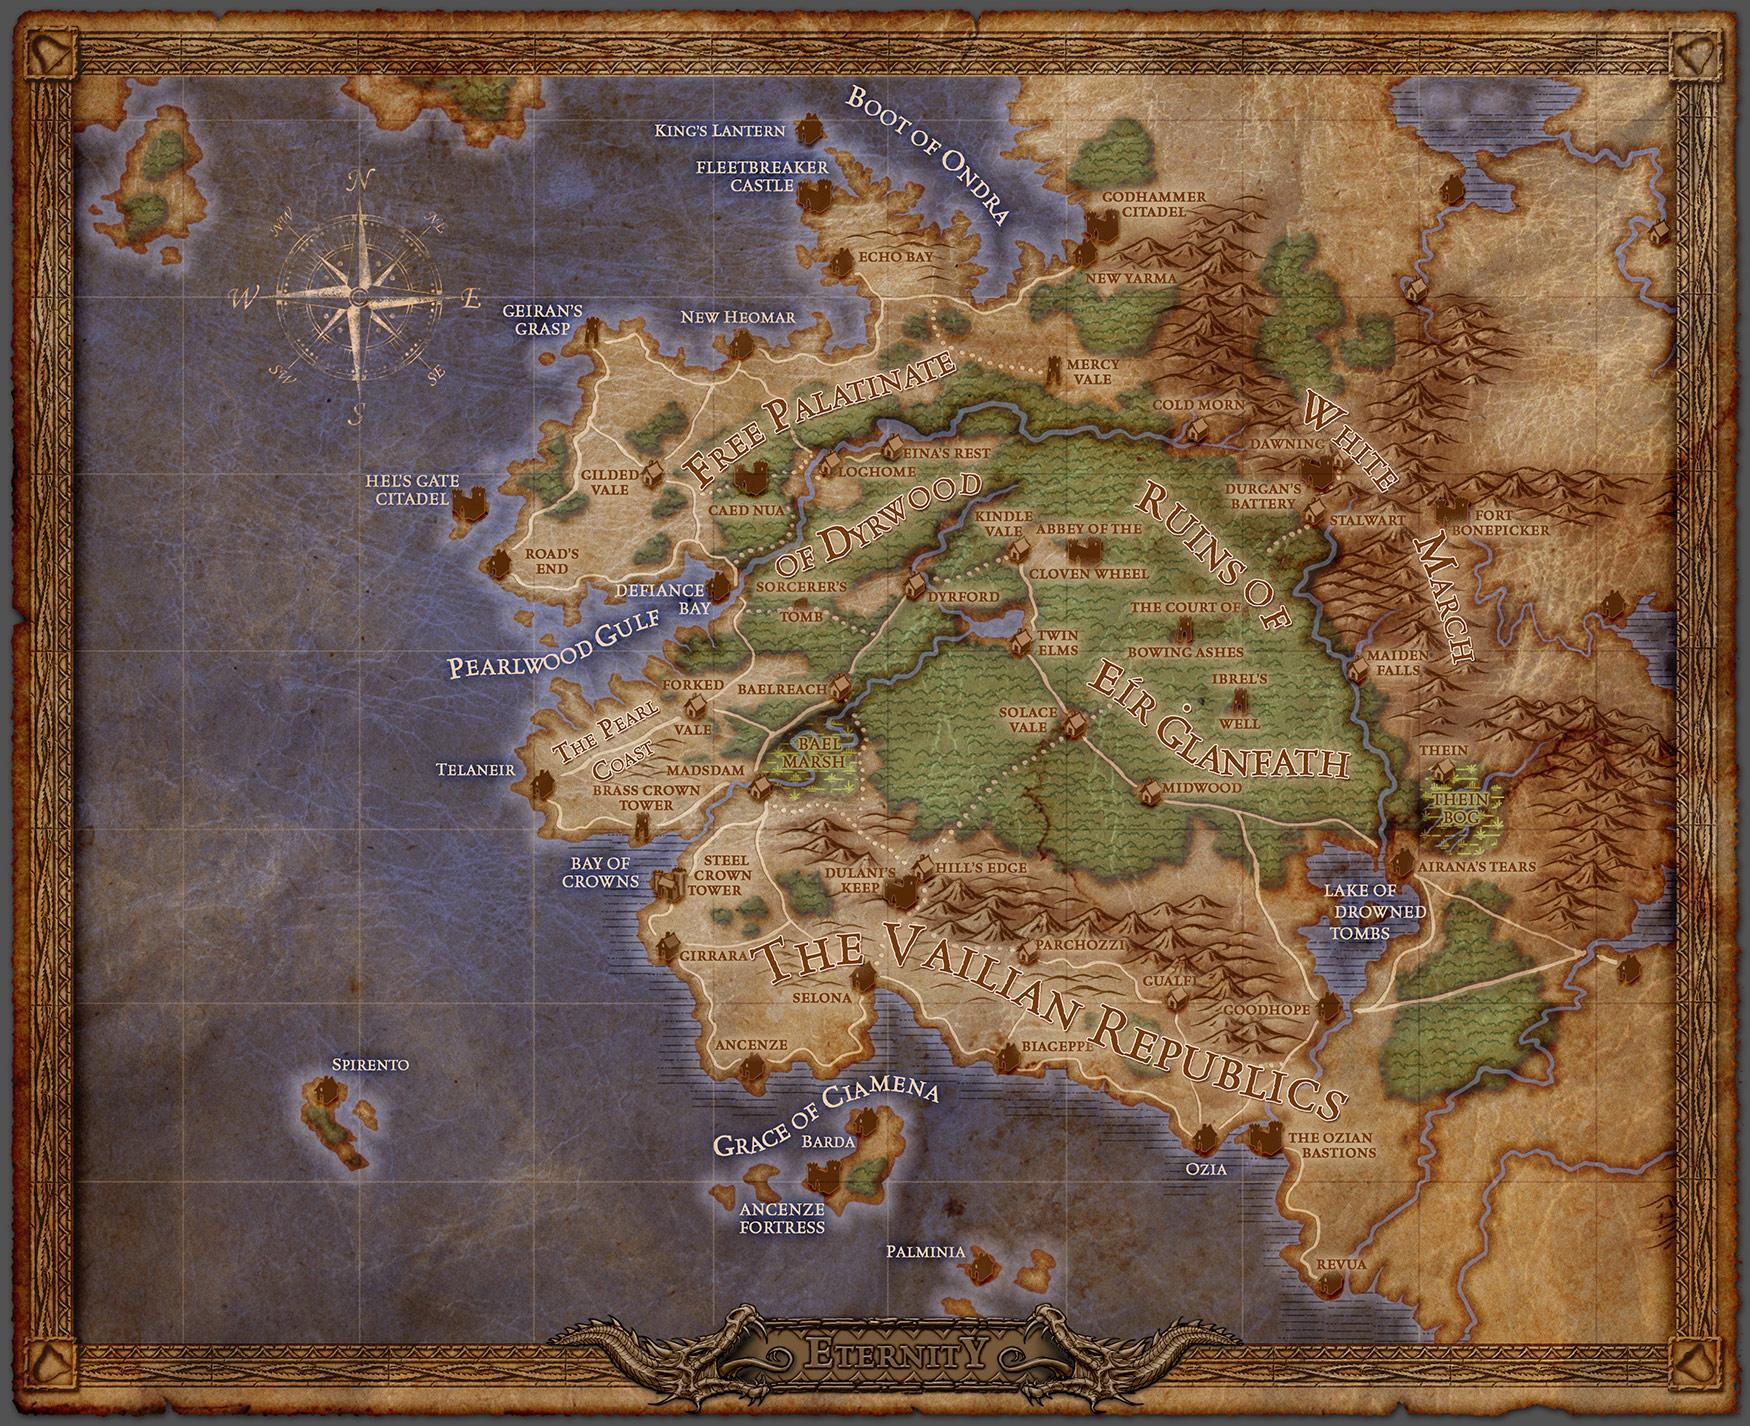 Map image Pillars of Eternity Mod DB